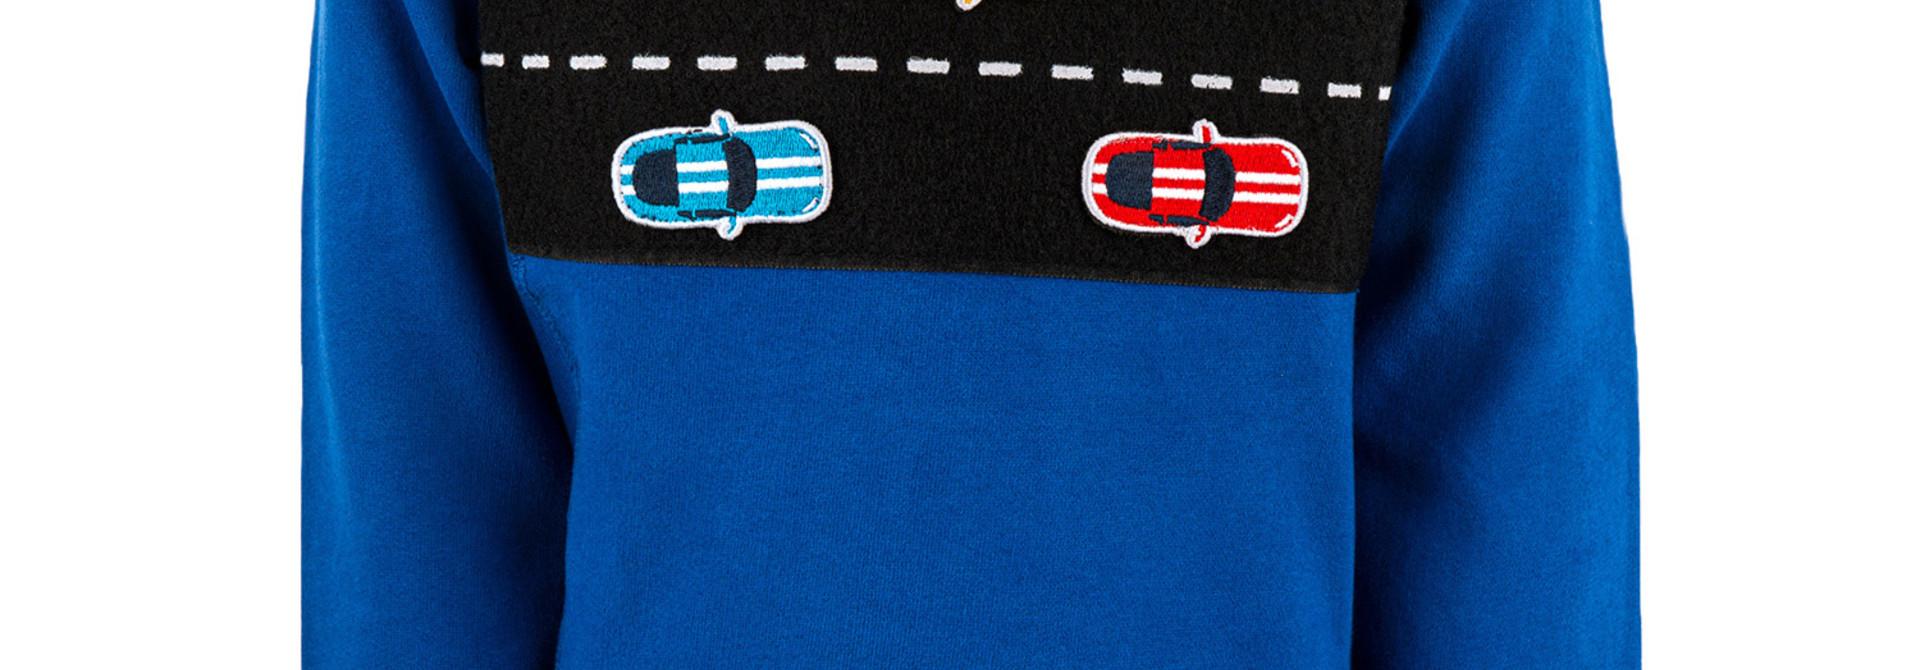 Stones and Bones sweater race cars